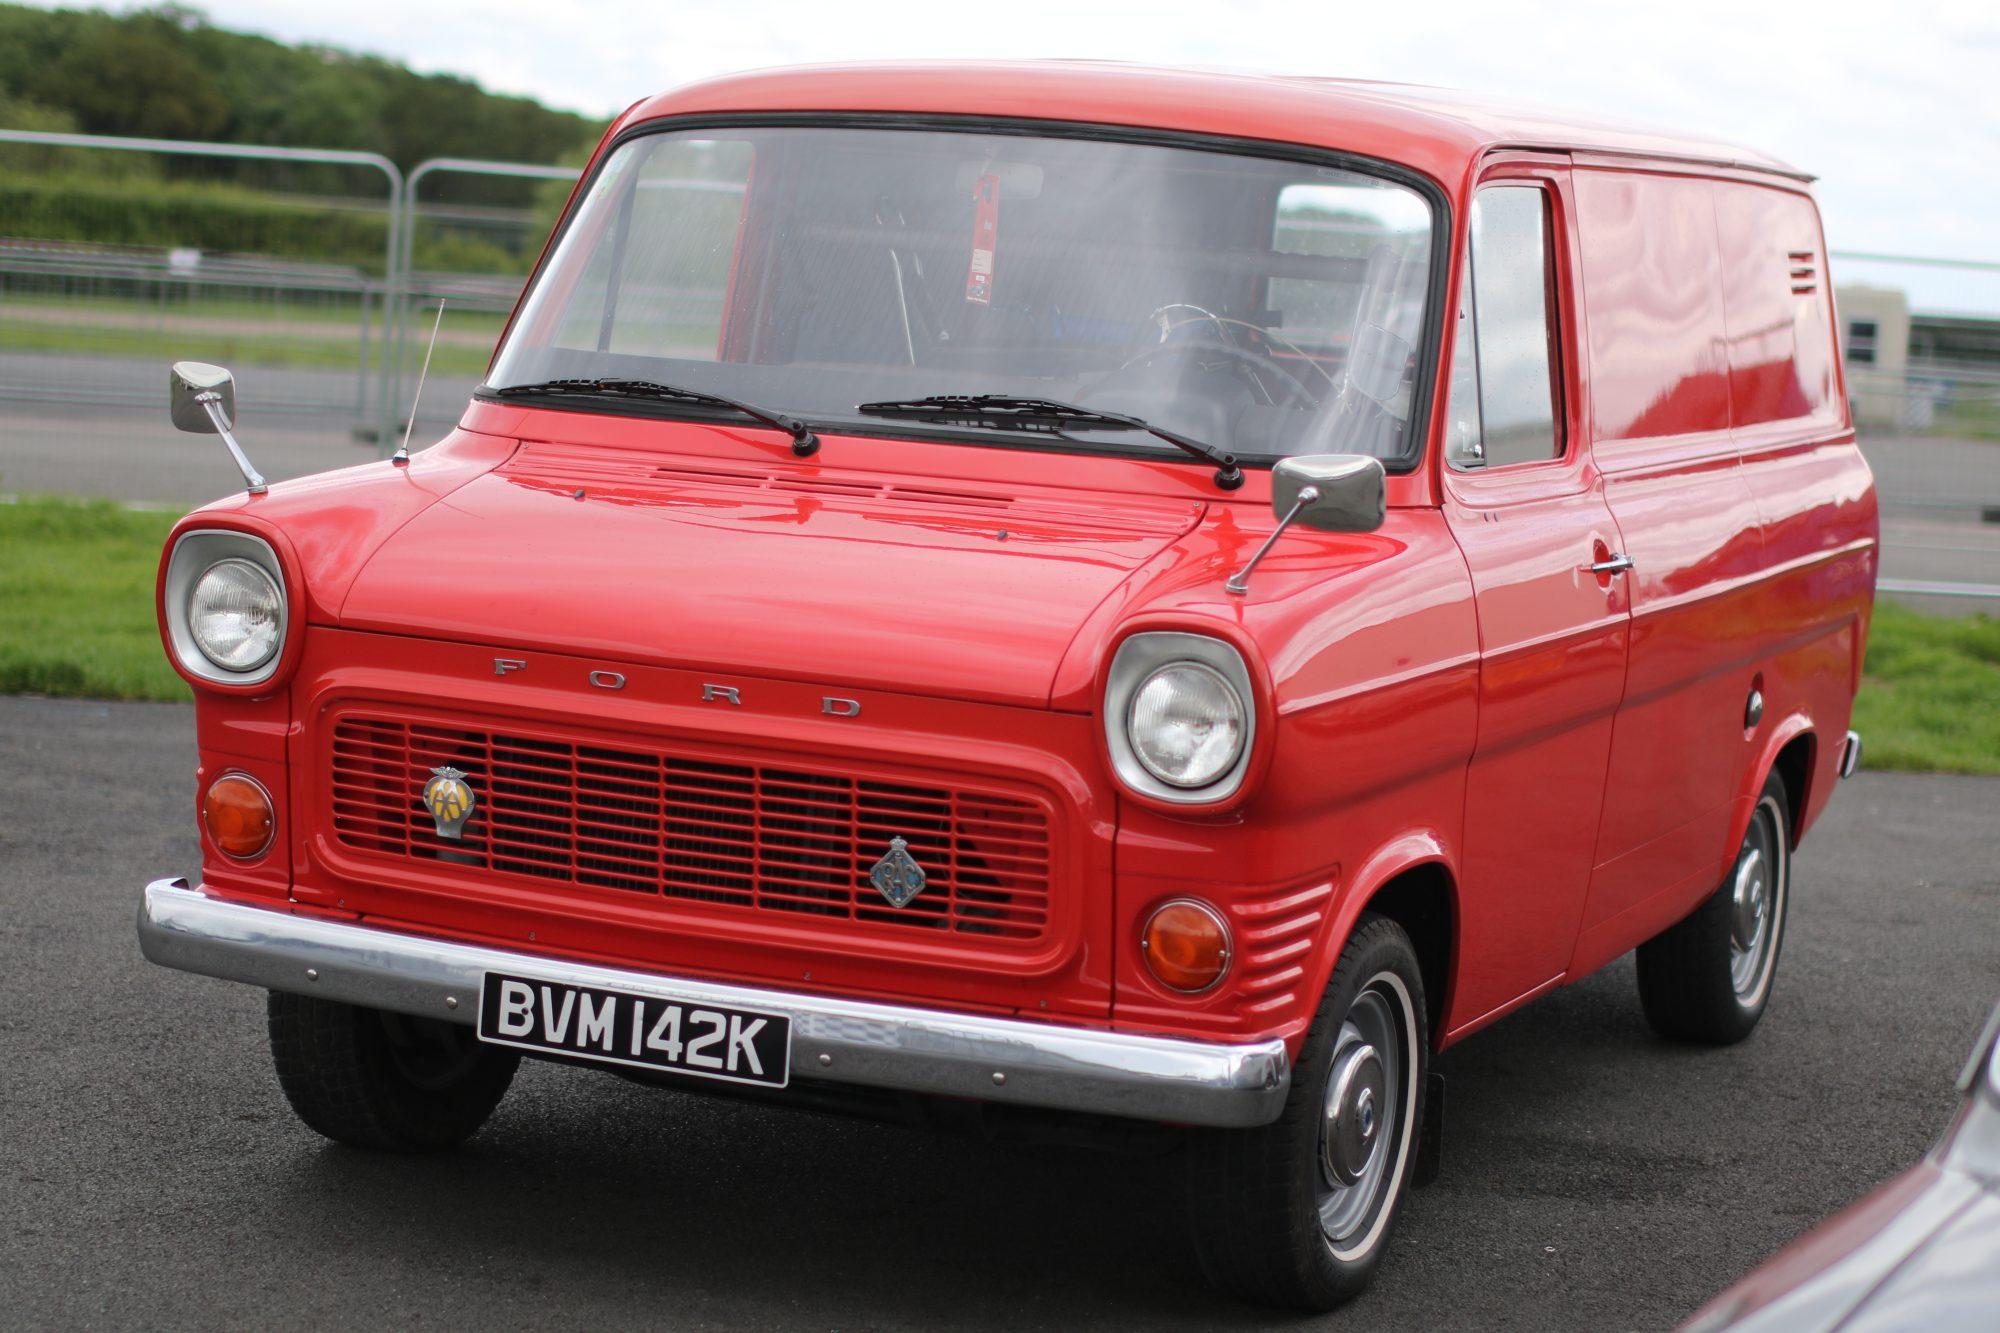 Retro Show, Retro cars, motoring, automotive, car show, car meet, classic car, Ford Transit